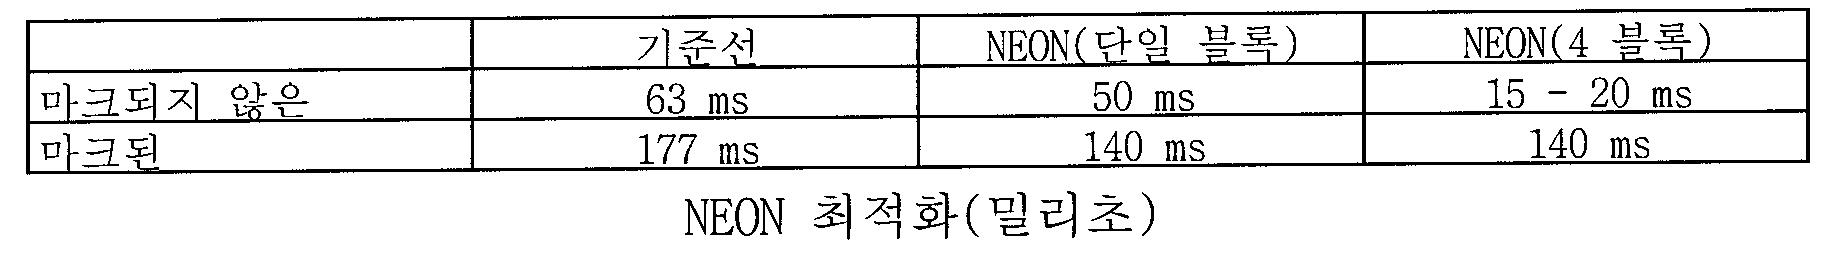 Figure 112013049341469-pct00002